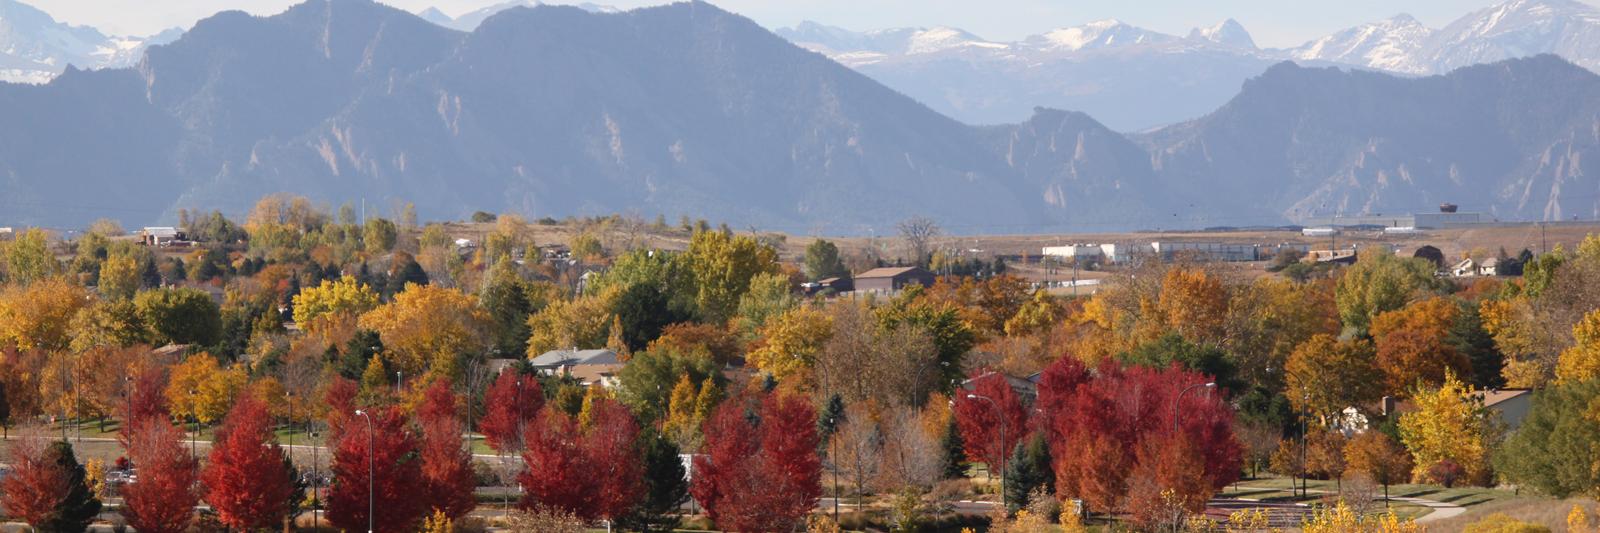 Mountain-View-in-Fall.jpg